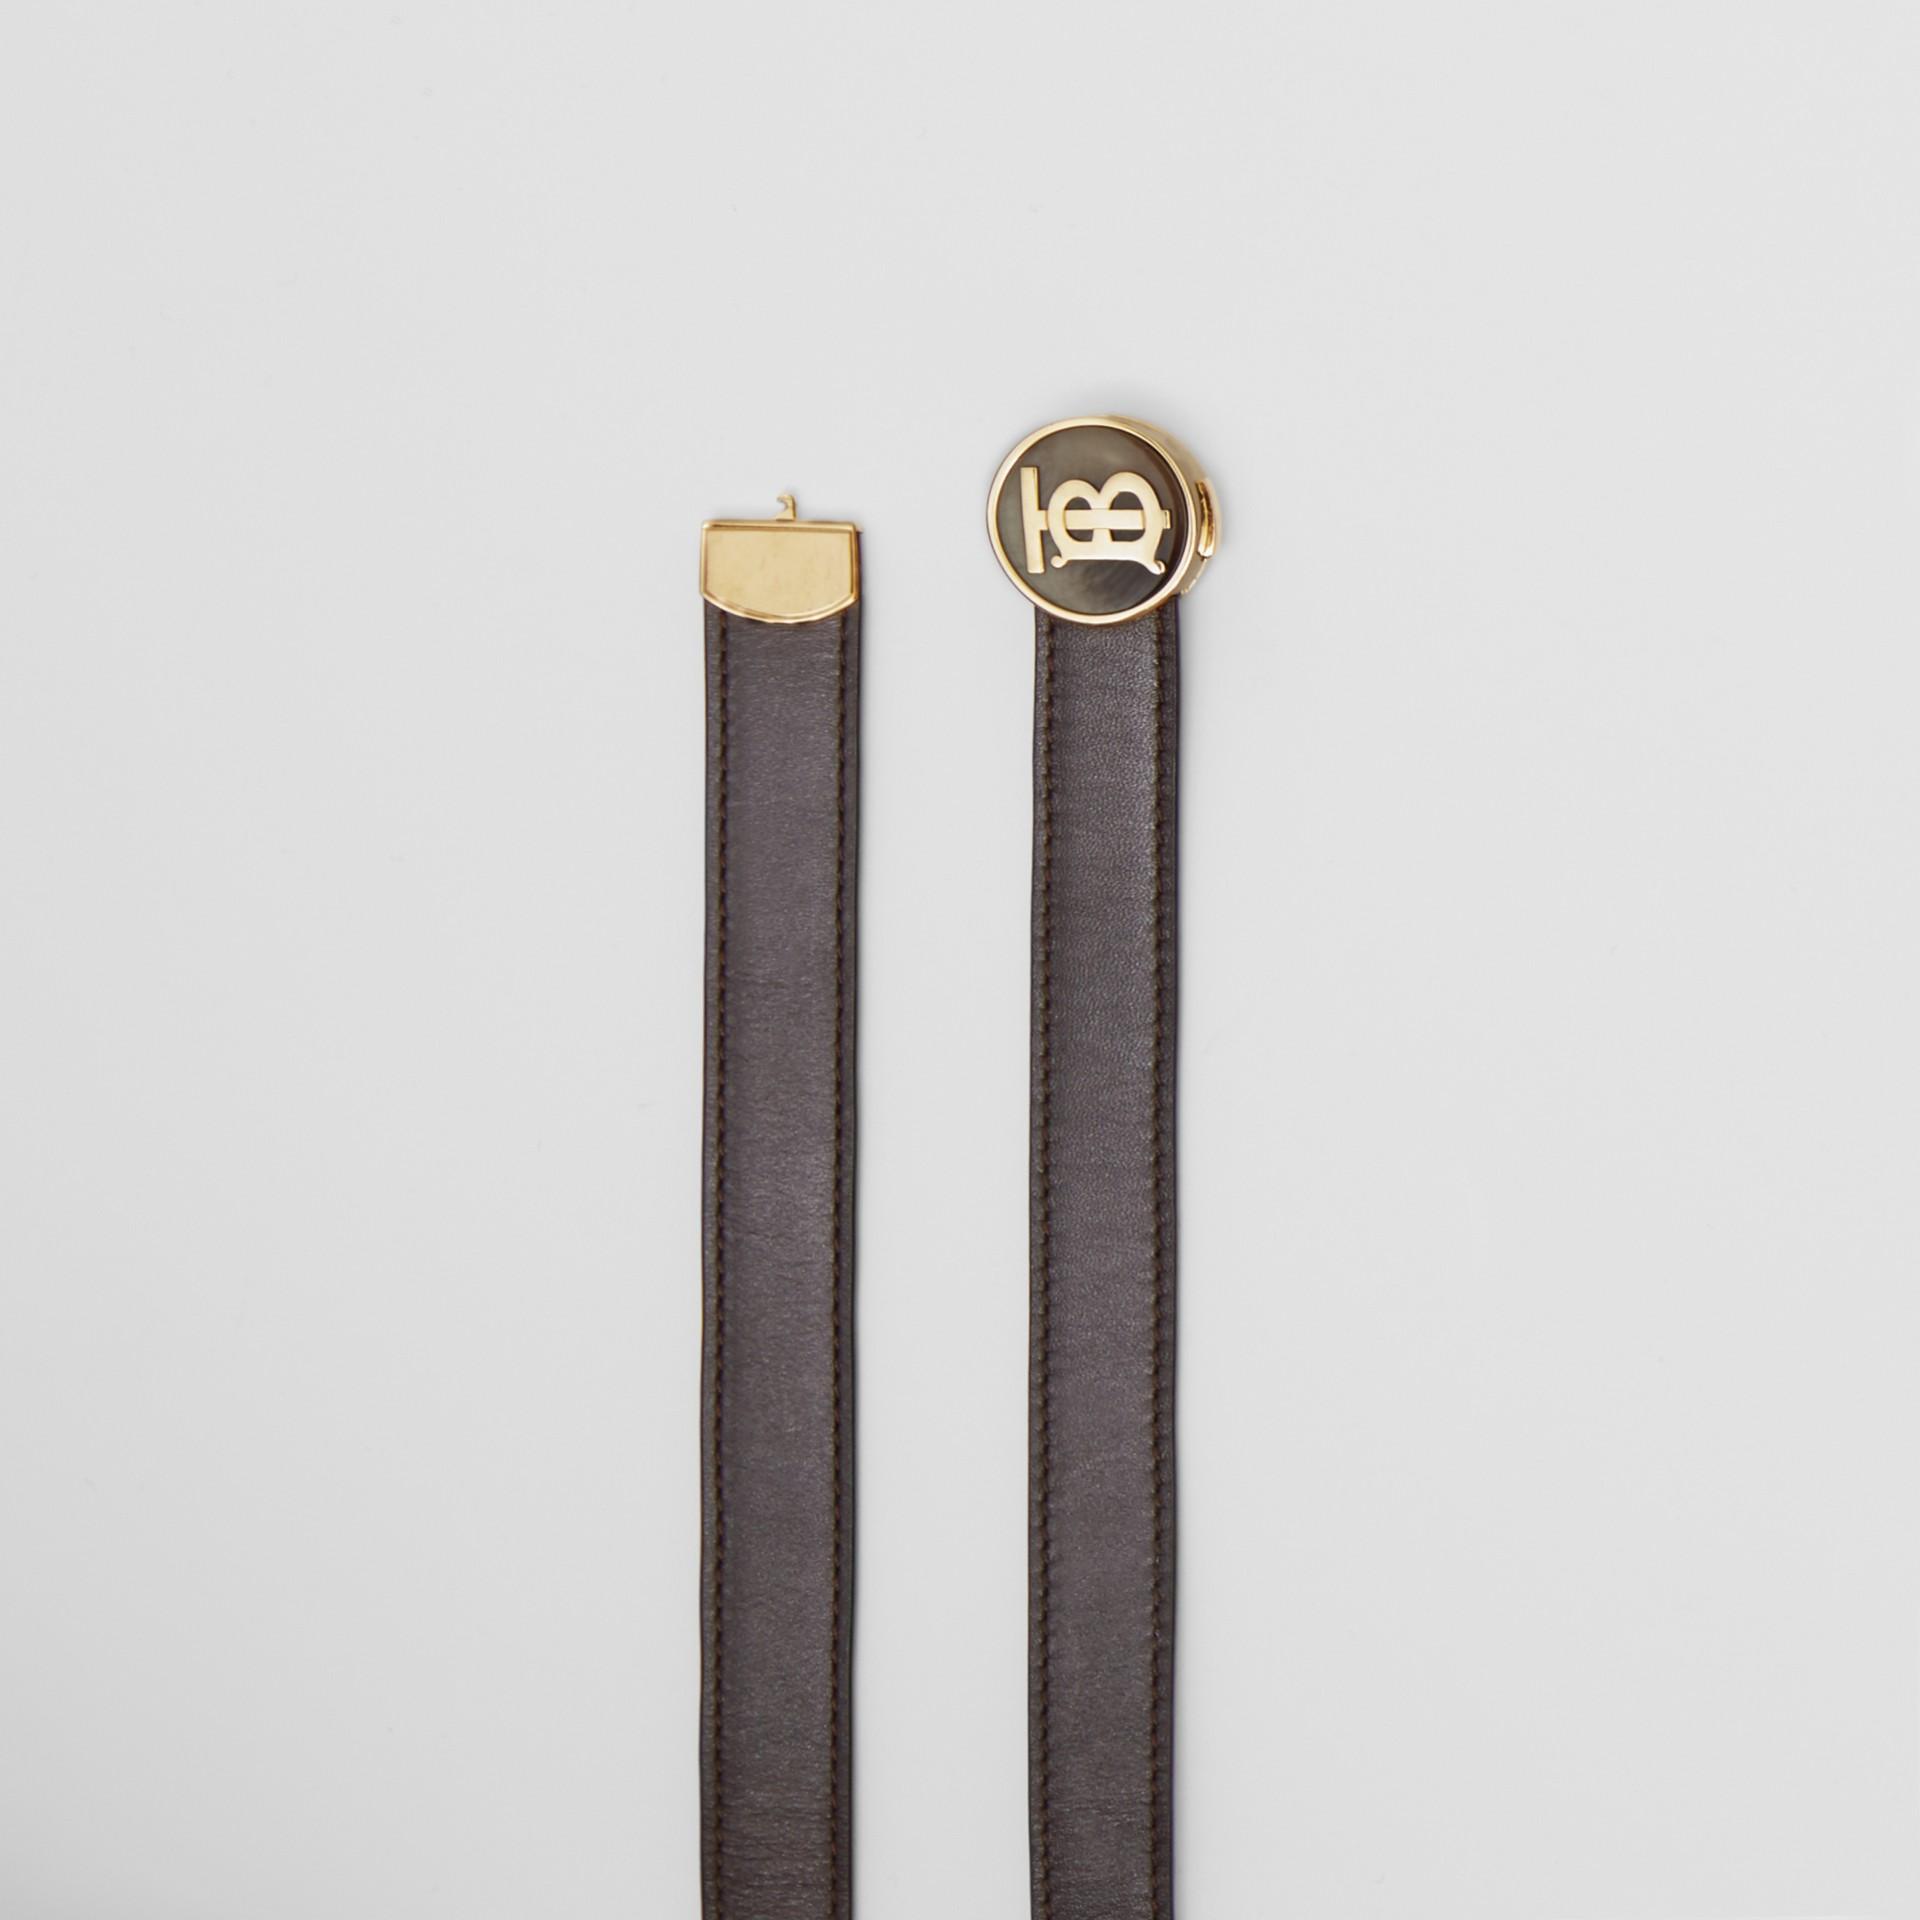 Ceinture en cuir Monogram (Brun Intense) - Femme | Burberry - photo de la galerie 5